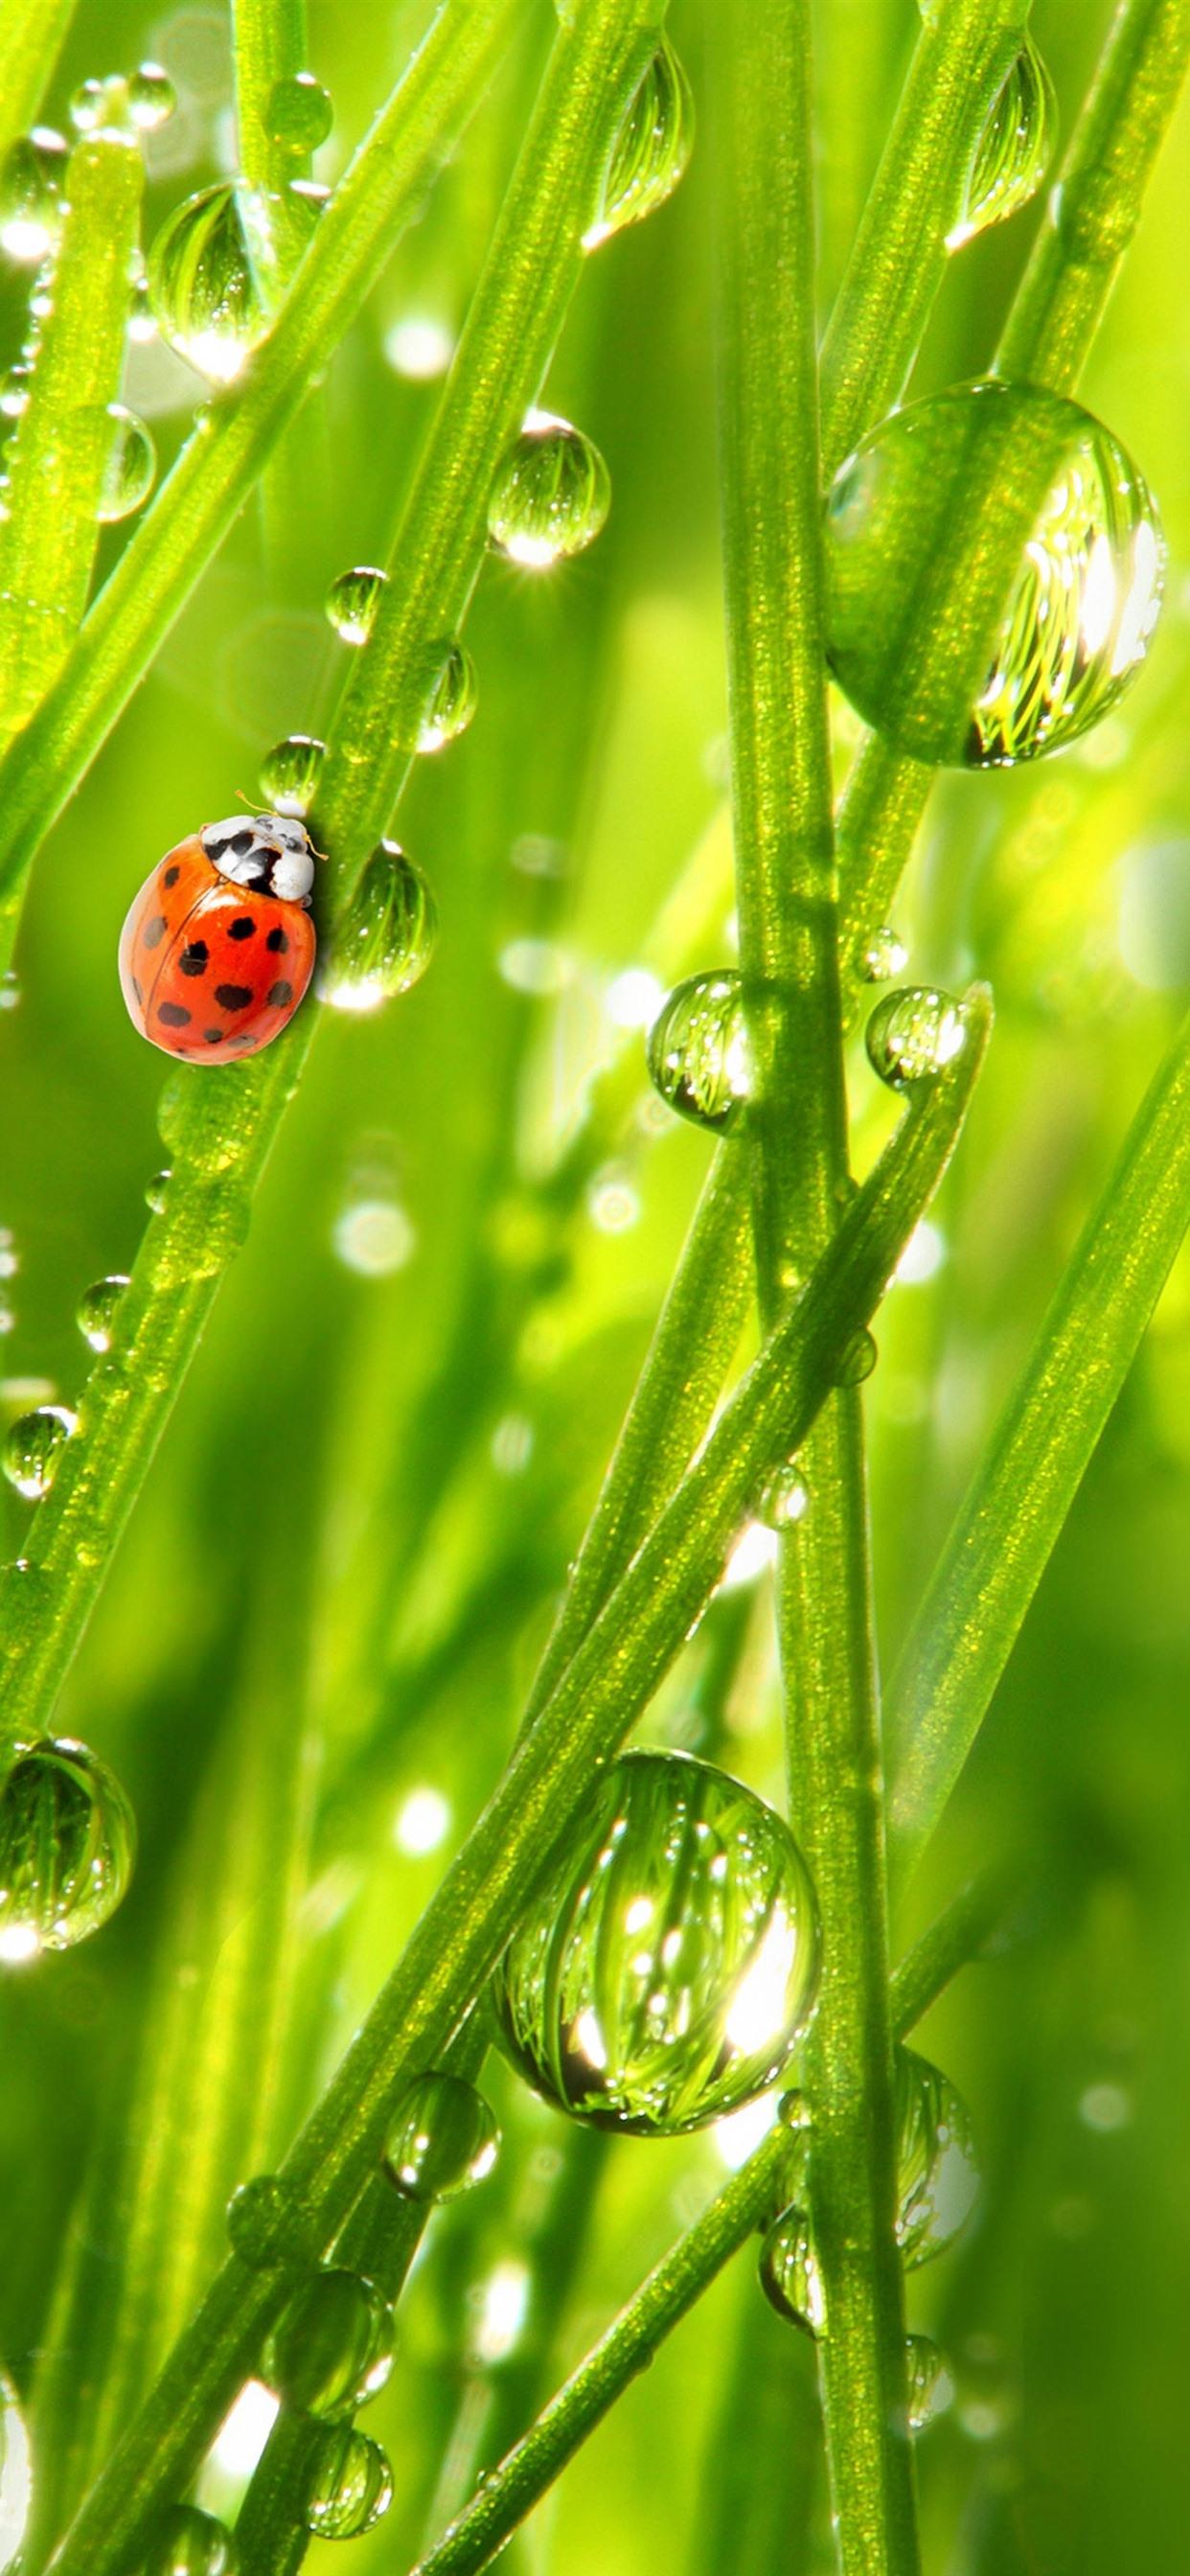 Ladybug Green Grass Water Droplets 1242x2688 Iphone Xs Max